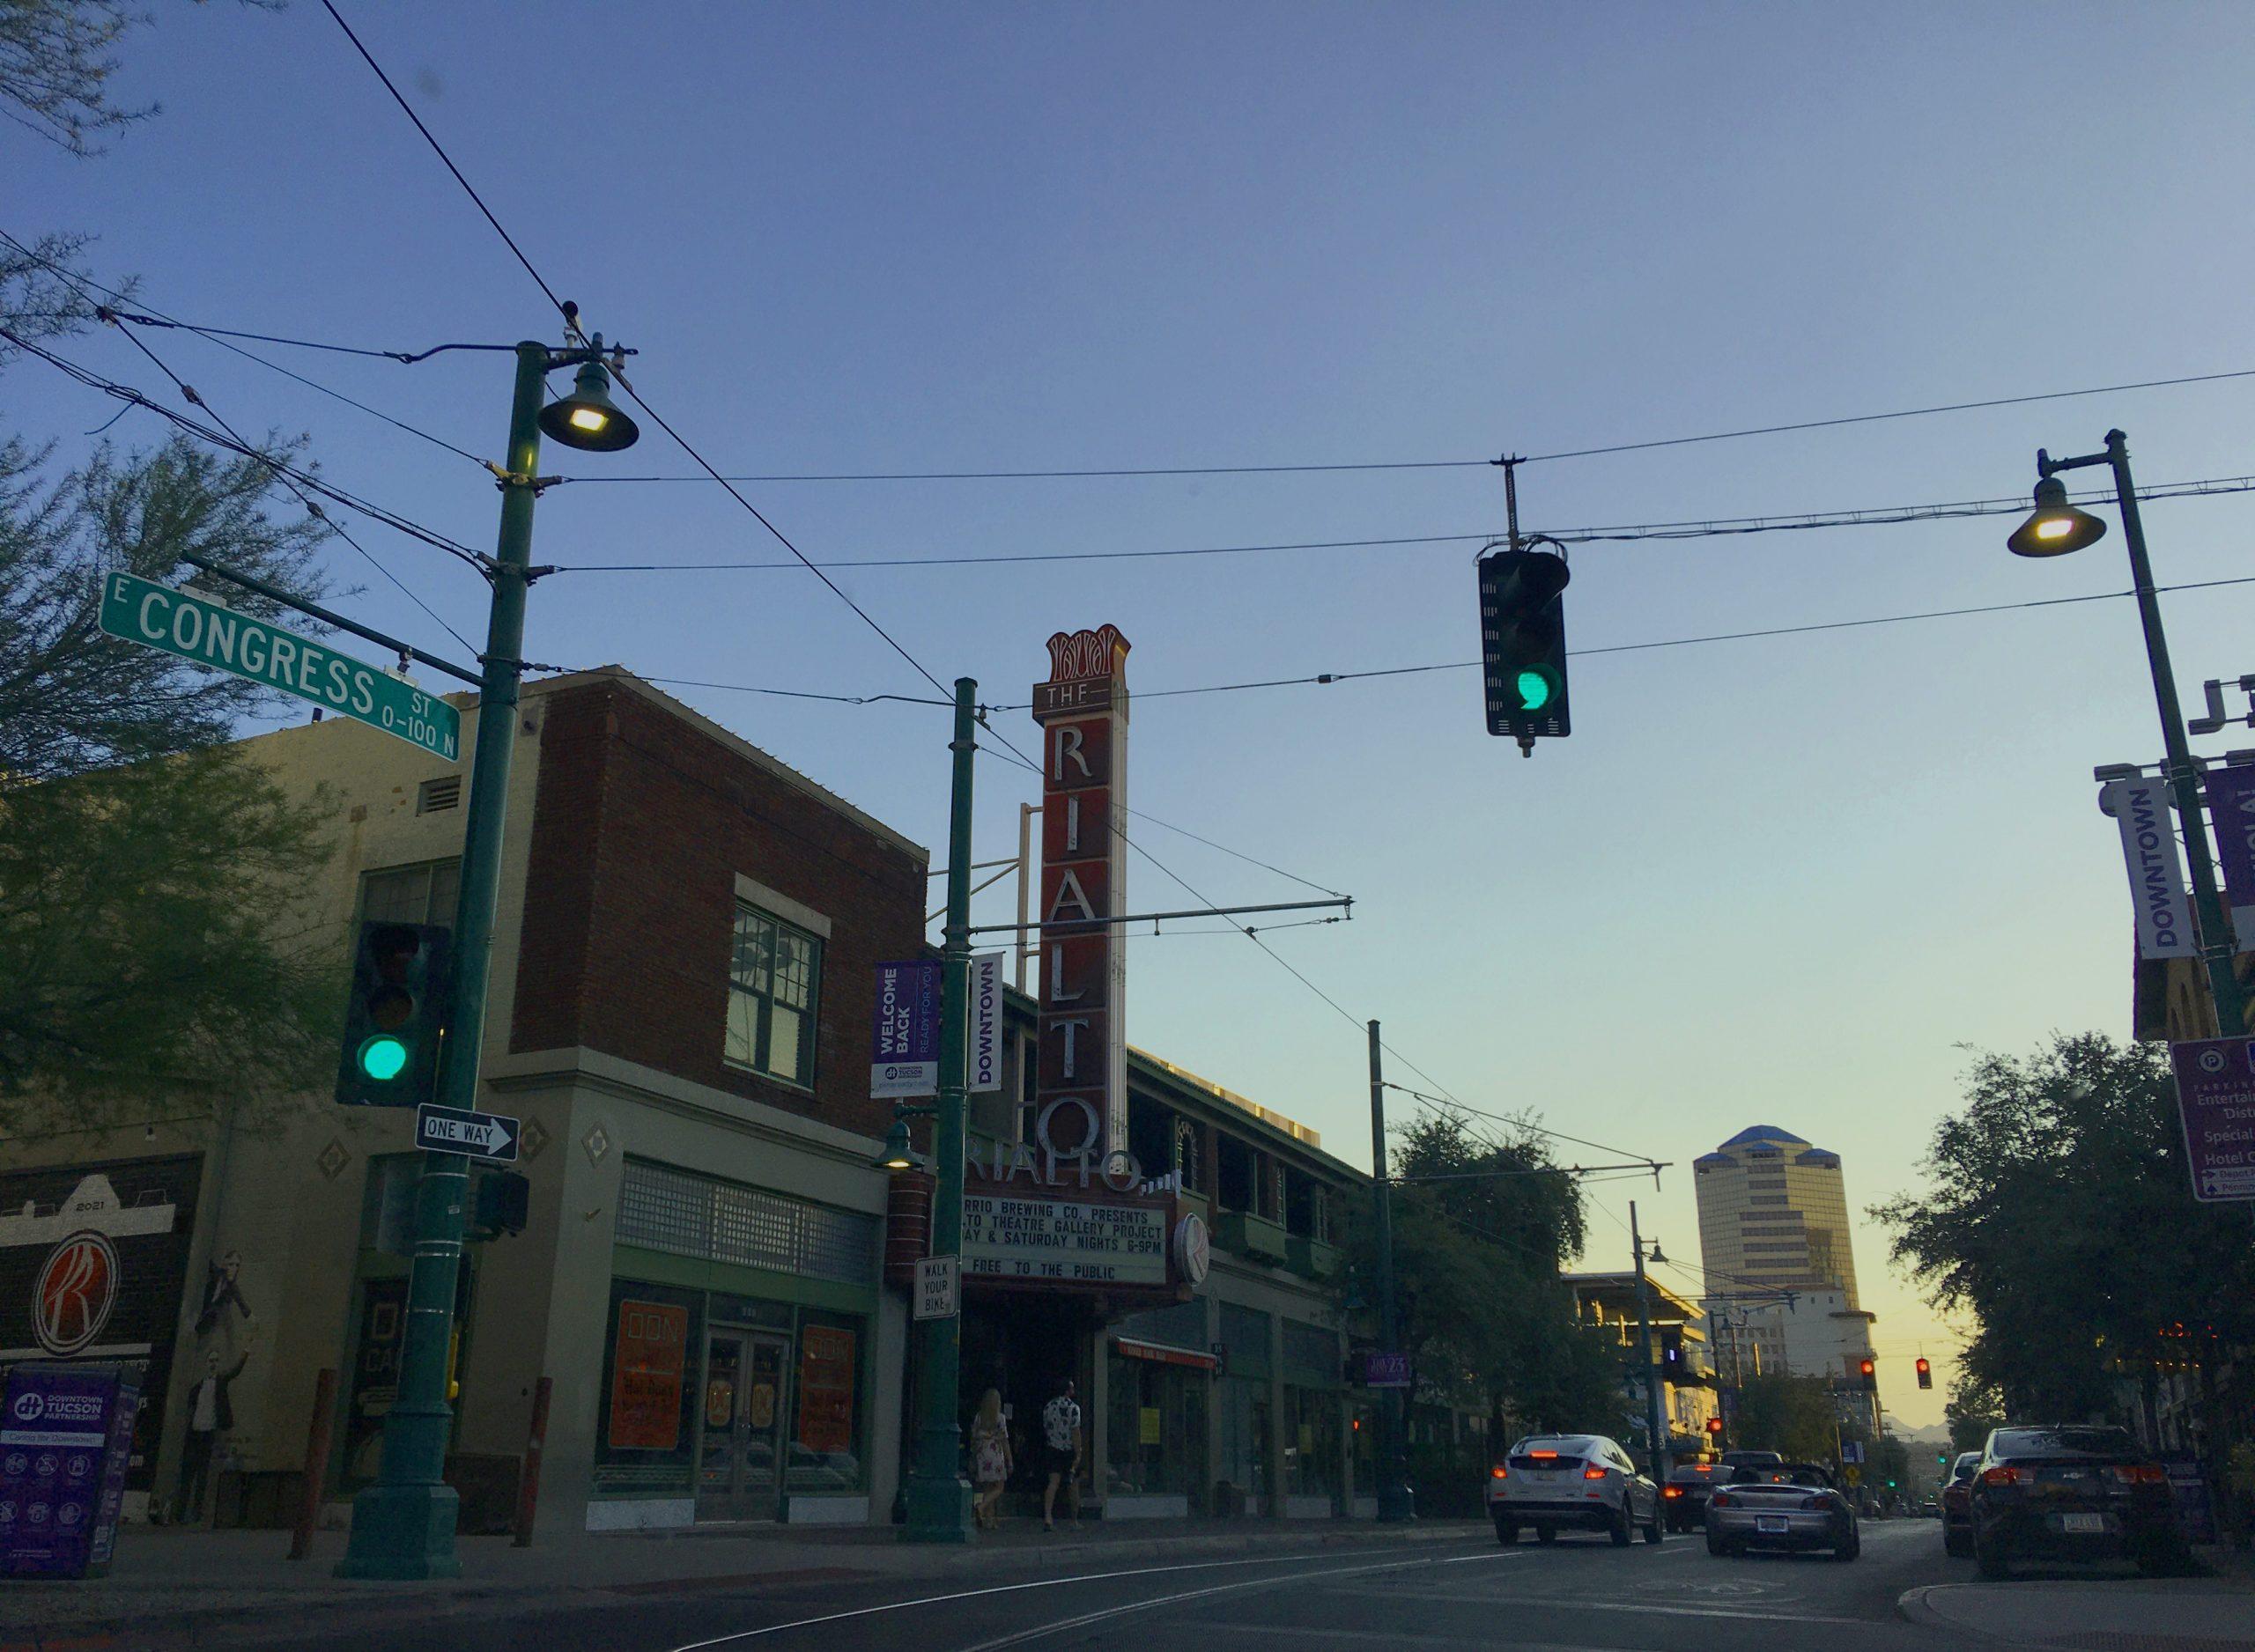 Local Tucson businesses gravitate toward the digital world as COVID-19 struck